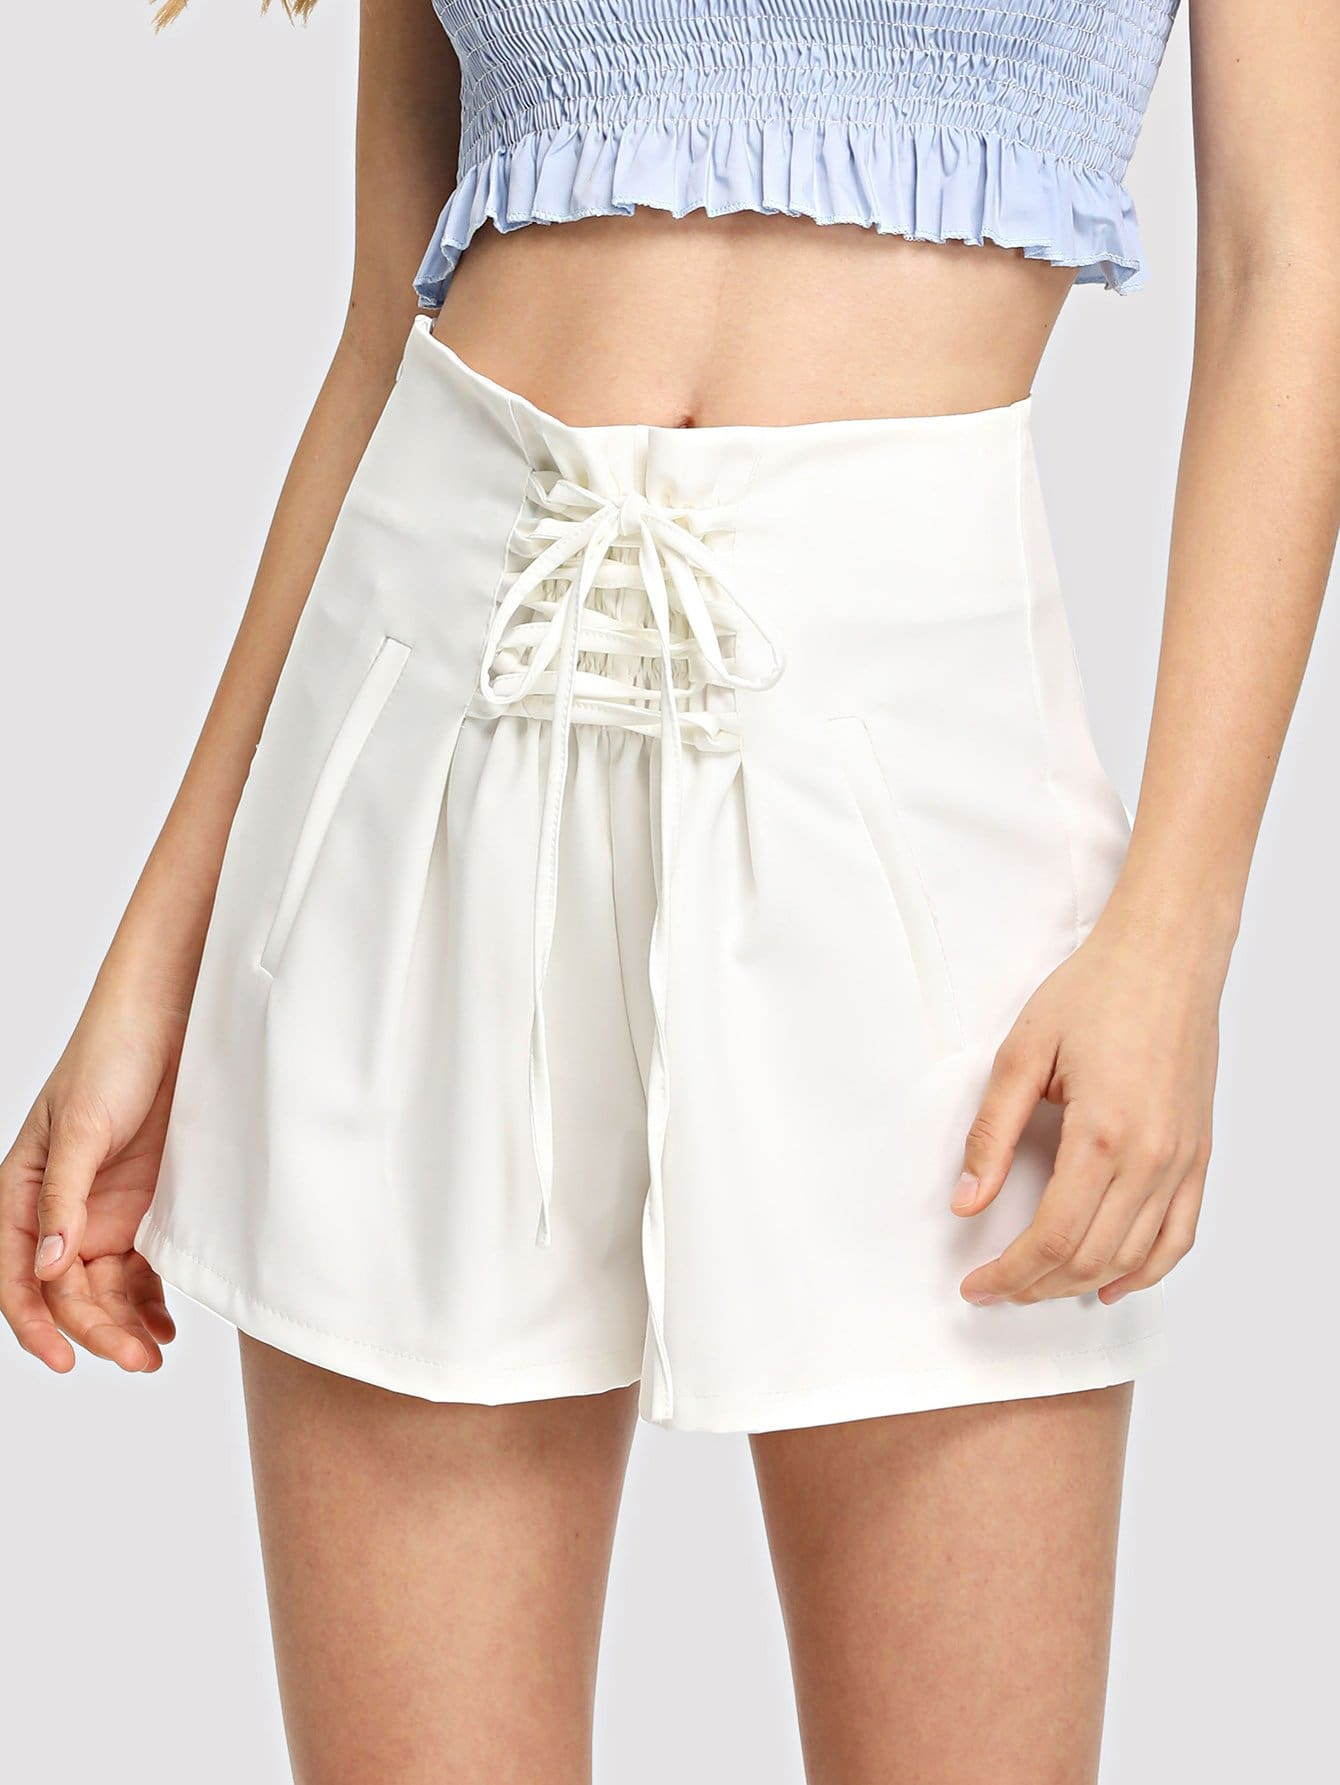 Lace Up Front High Waist Shorts сковорода d 24 см с крышкой frybest skin cm f24ik skin